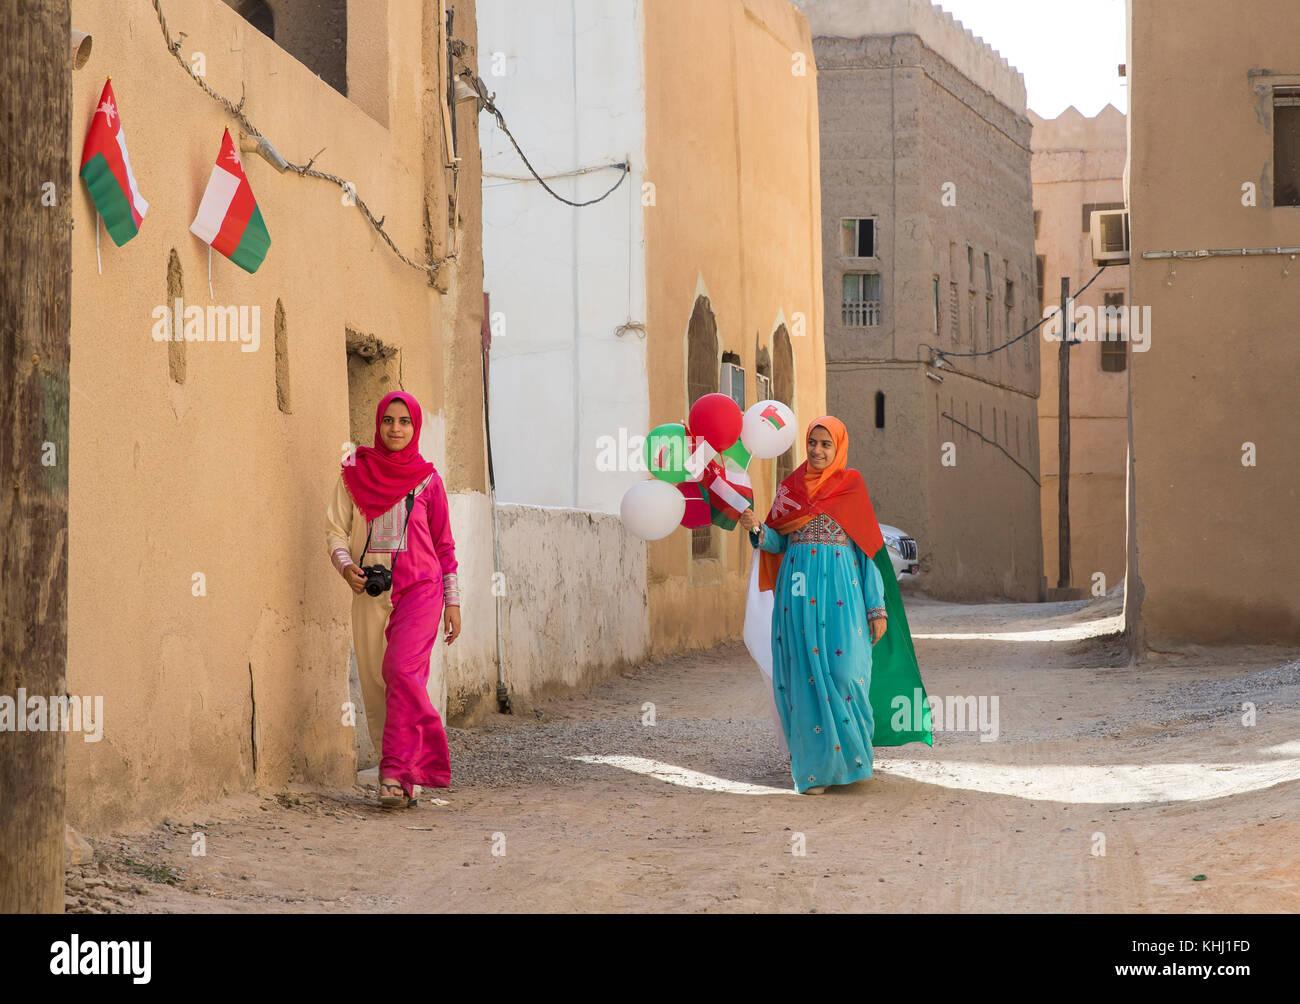 Al Hamra, Oman, November 10th, 2017: Omani girl in national dress with omani flag and baloons in celebration of - Stock Image